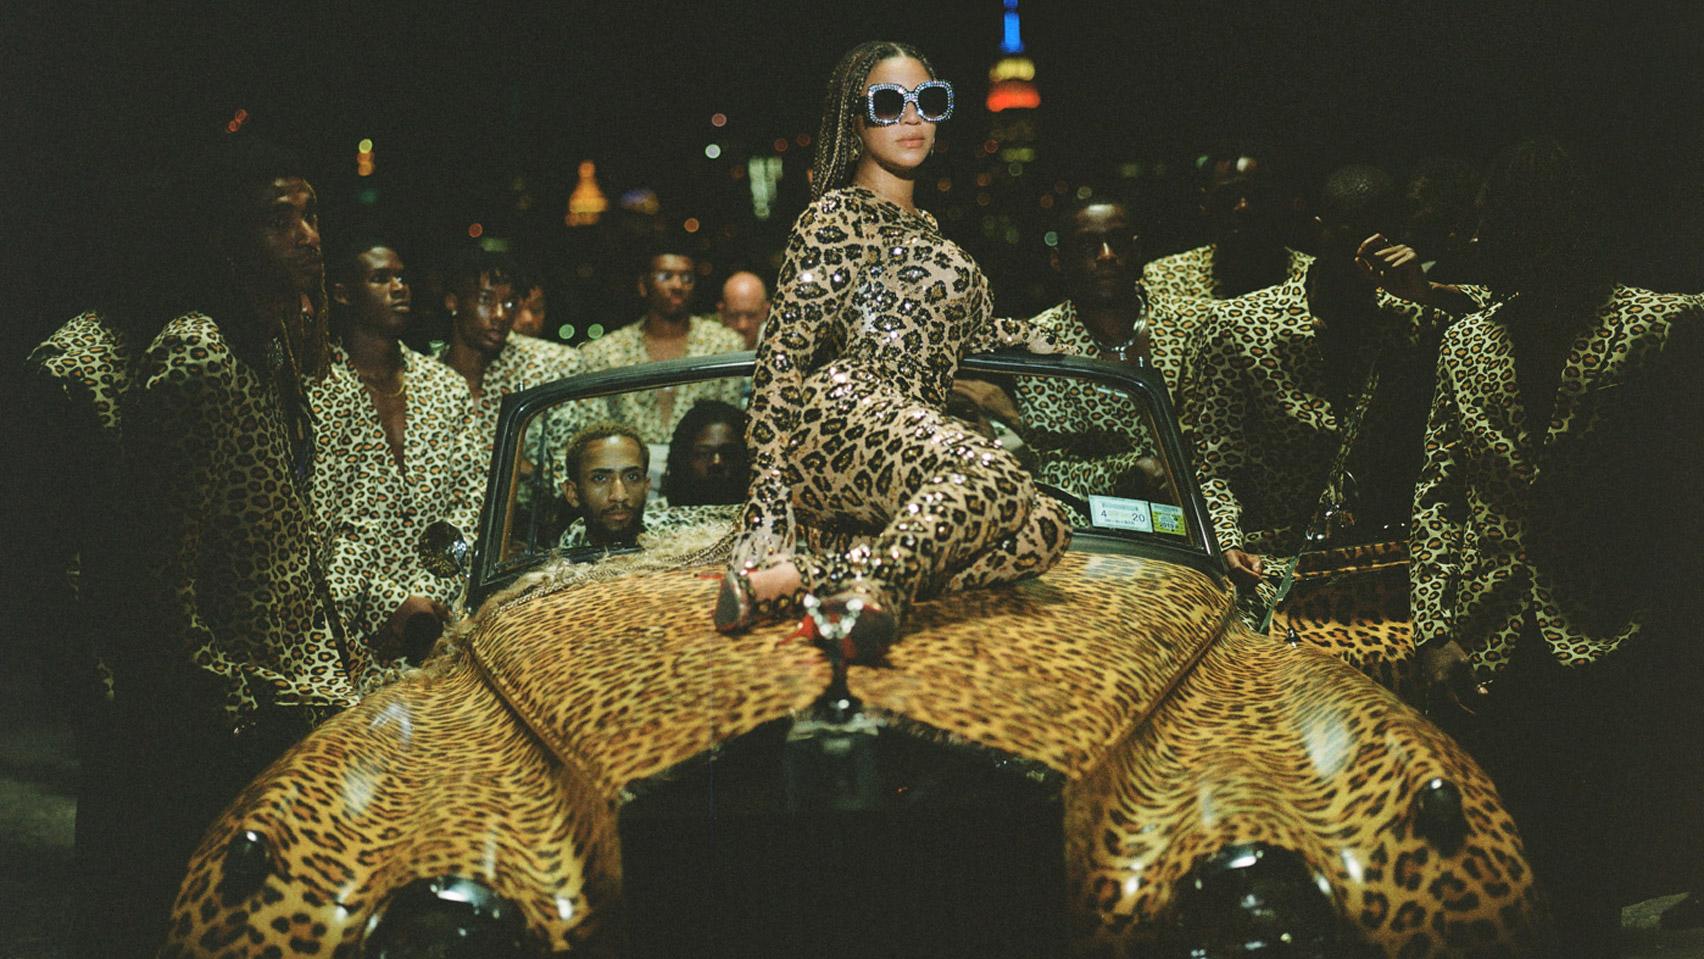 Dezeen interviews Beyoncé's stylist Zerina Akers on Black Is King